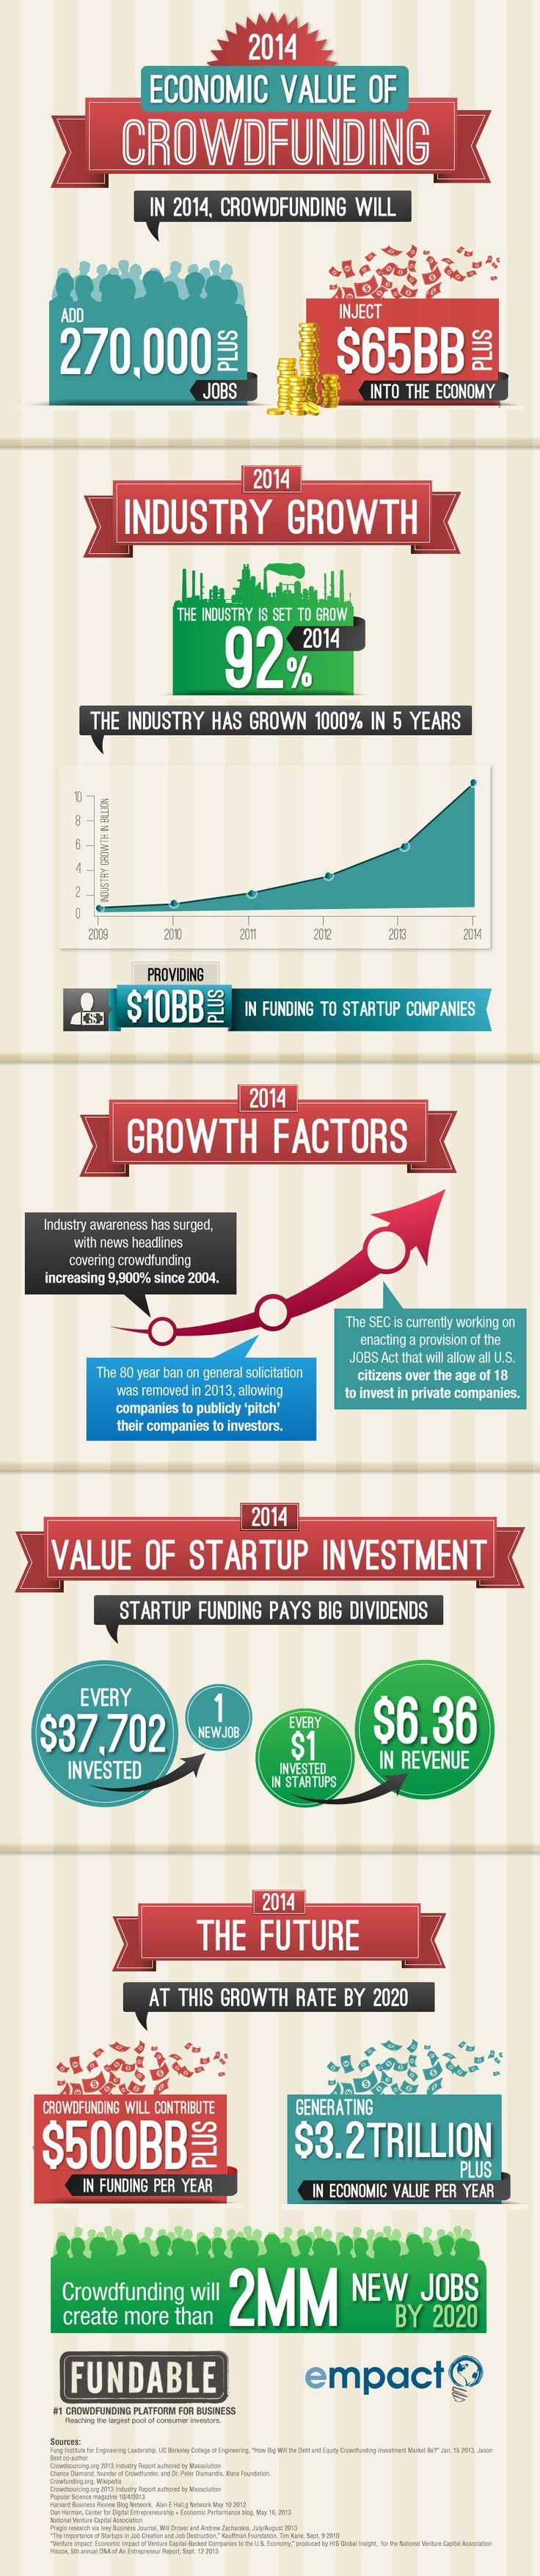 1390257244-crowdfunding-seen-provideing-65-billion-boost-global-economy-2014-infographic.jpg (1000×4772)